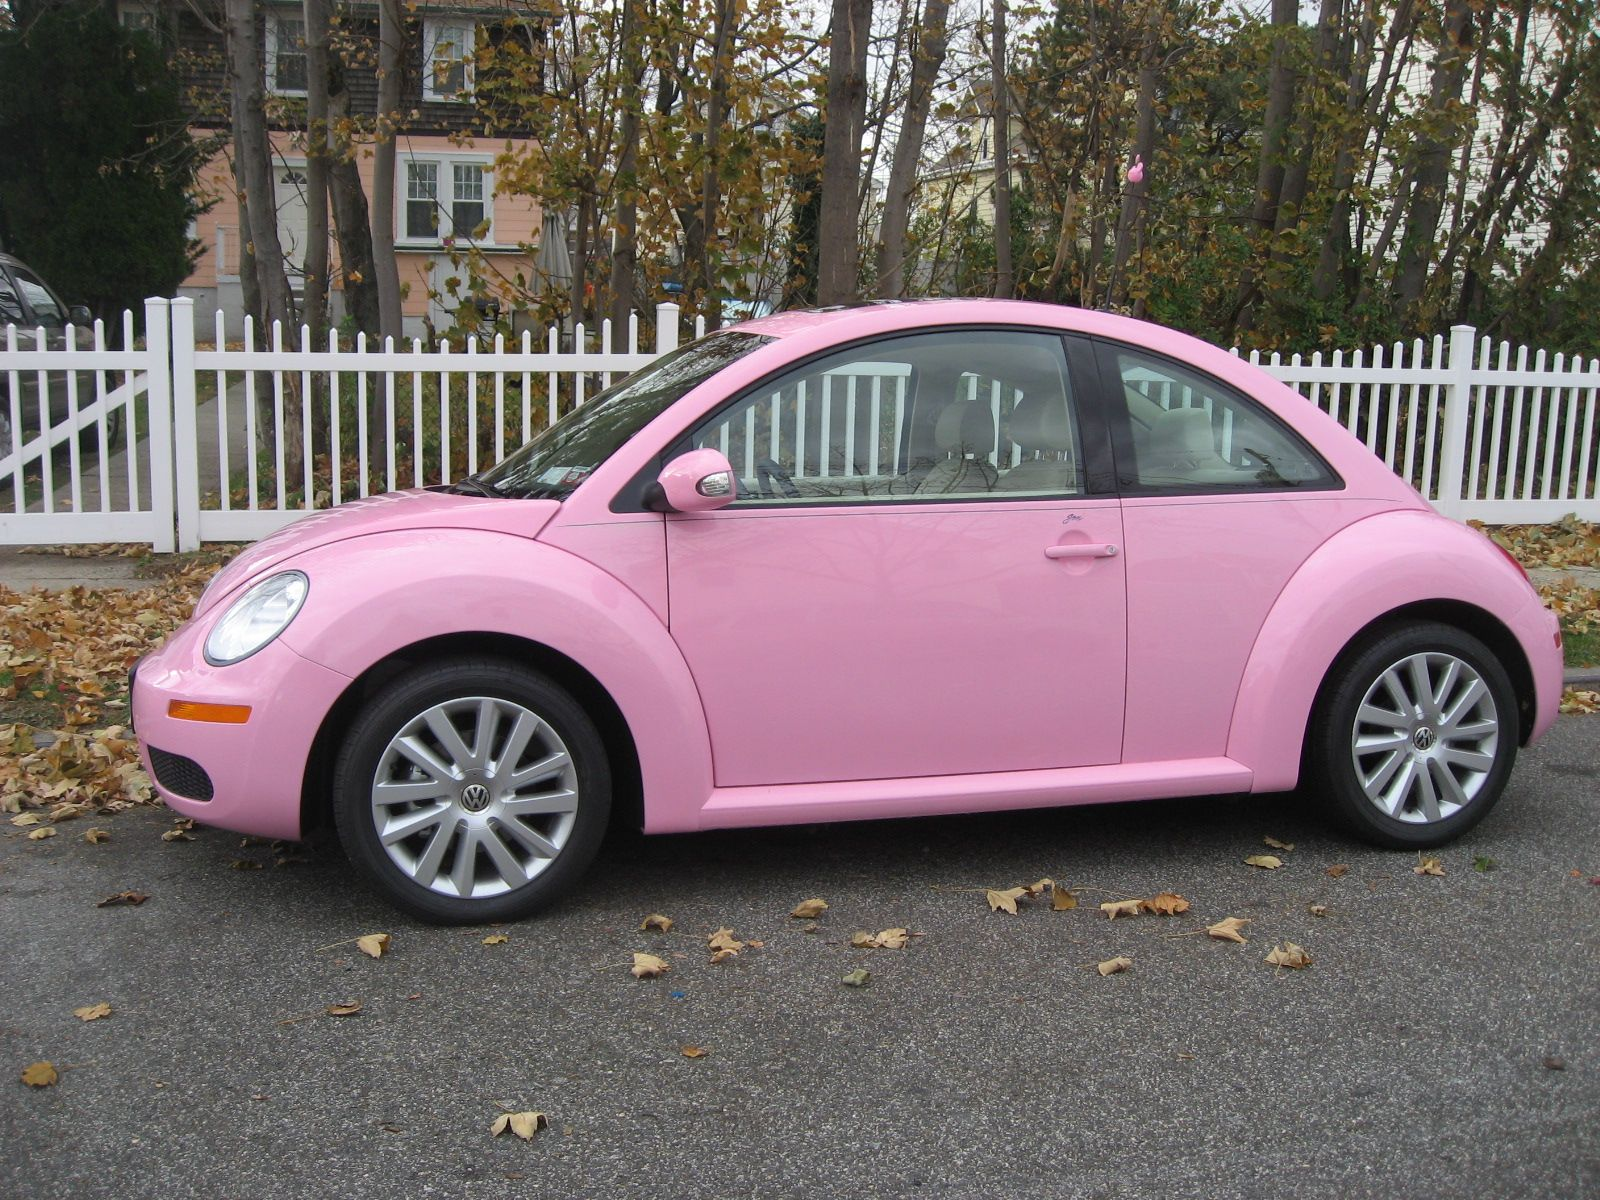 wallpaper eyelashes beetle volkswagen pink with